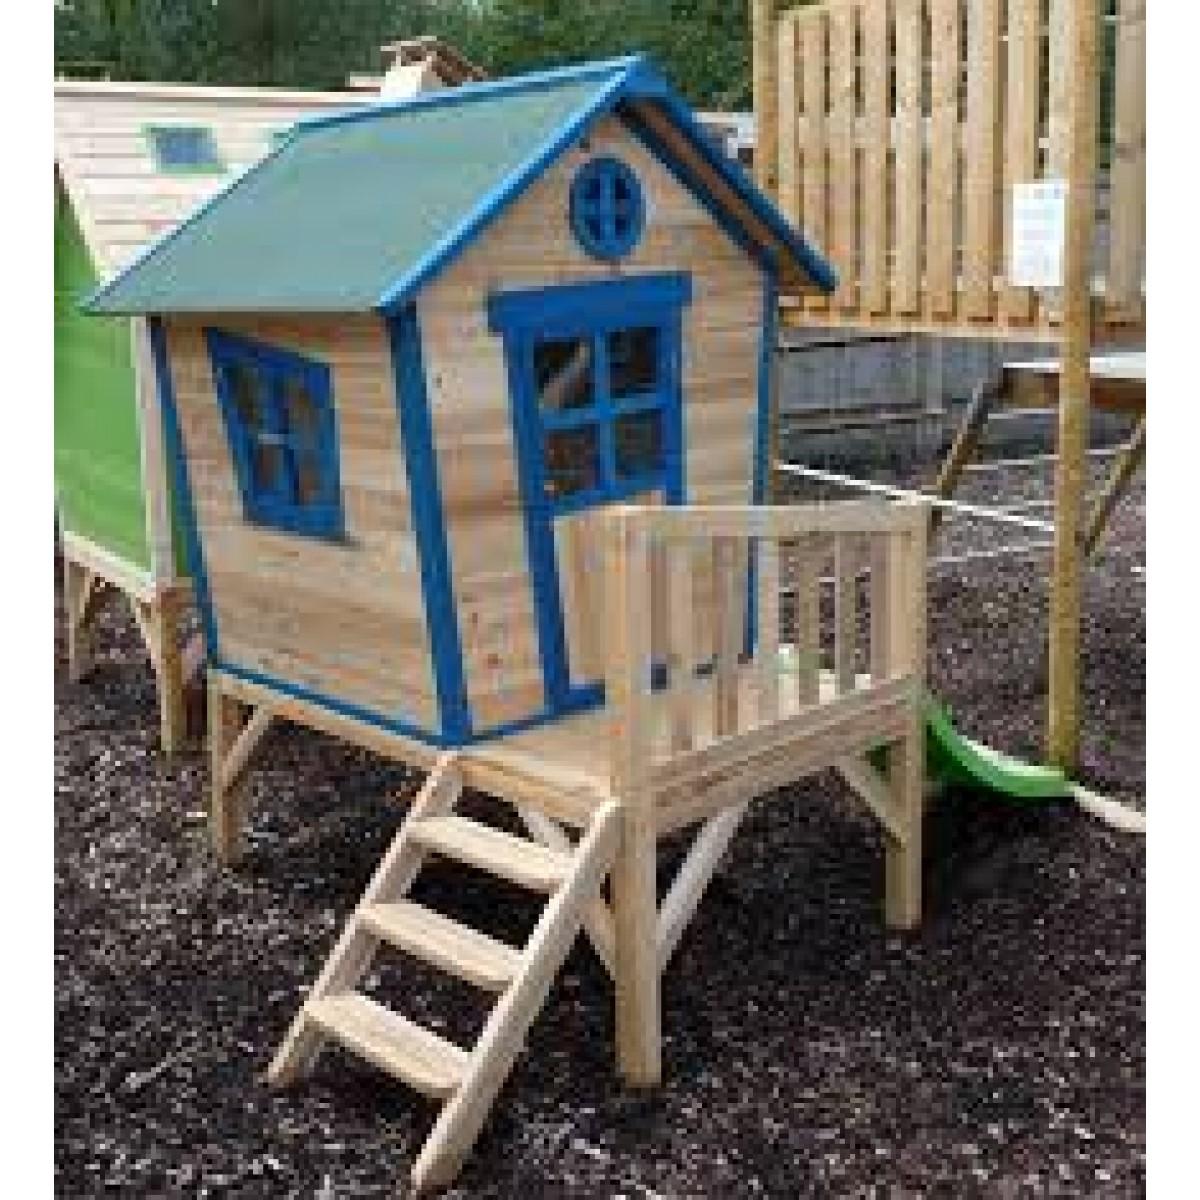 Идеи для детского домика на даче своими руками фото